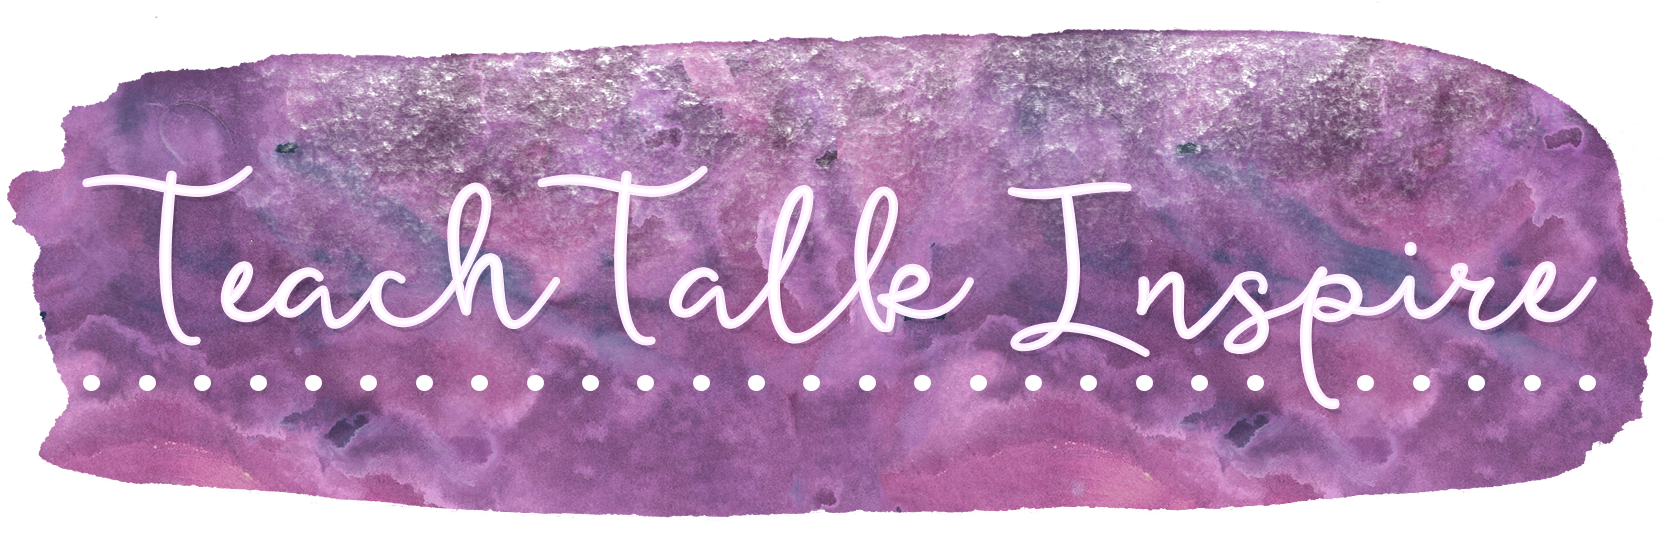 Teach Talk Inspire